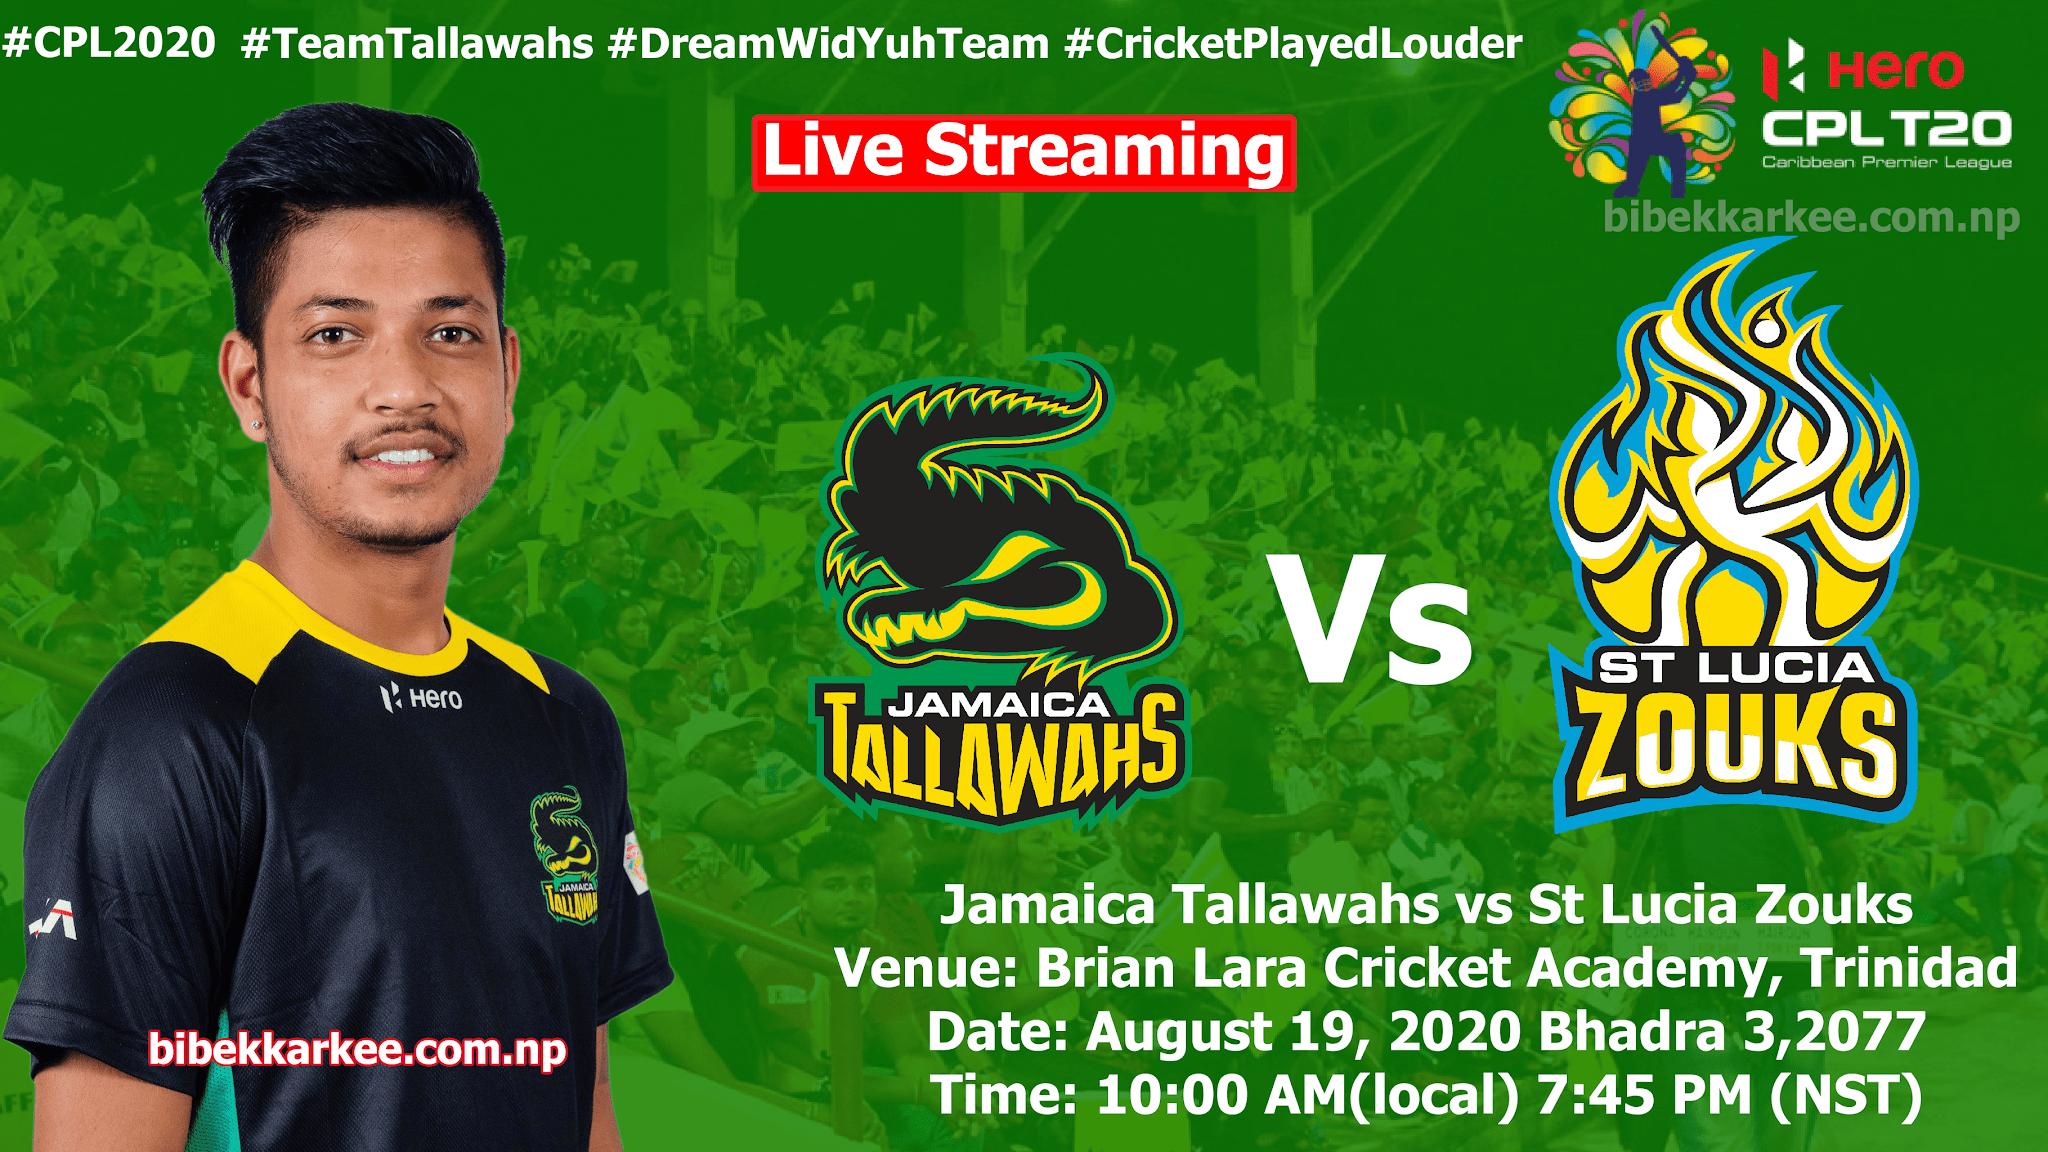 CPL 2020 Watch Live: Sandeep's Team Jamaica Tallawahs vs St Lucia Zouks , Jamaica Tallawahs vs St Lucia Zouks, sandeep lamichhane match live, cpl 2020 live streaming, sandeep lamichhane cpl 2020